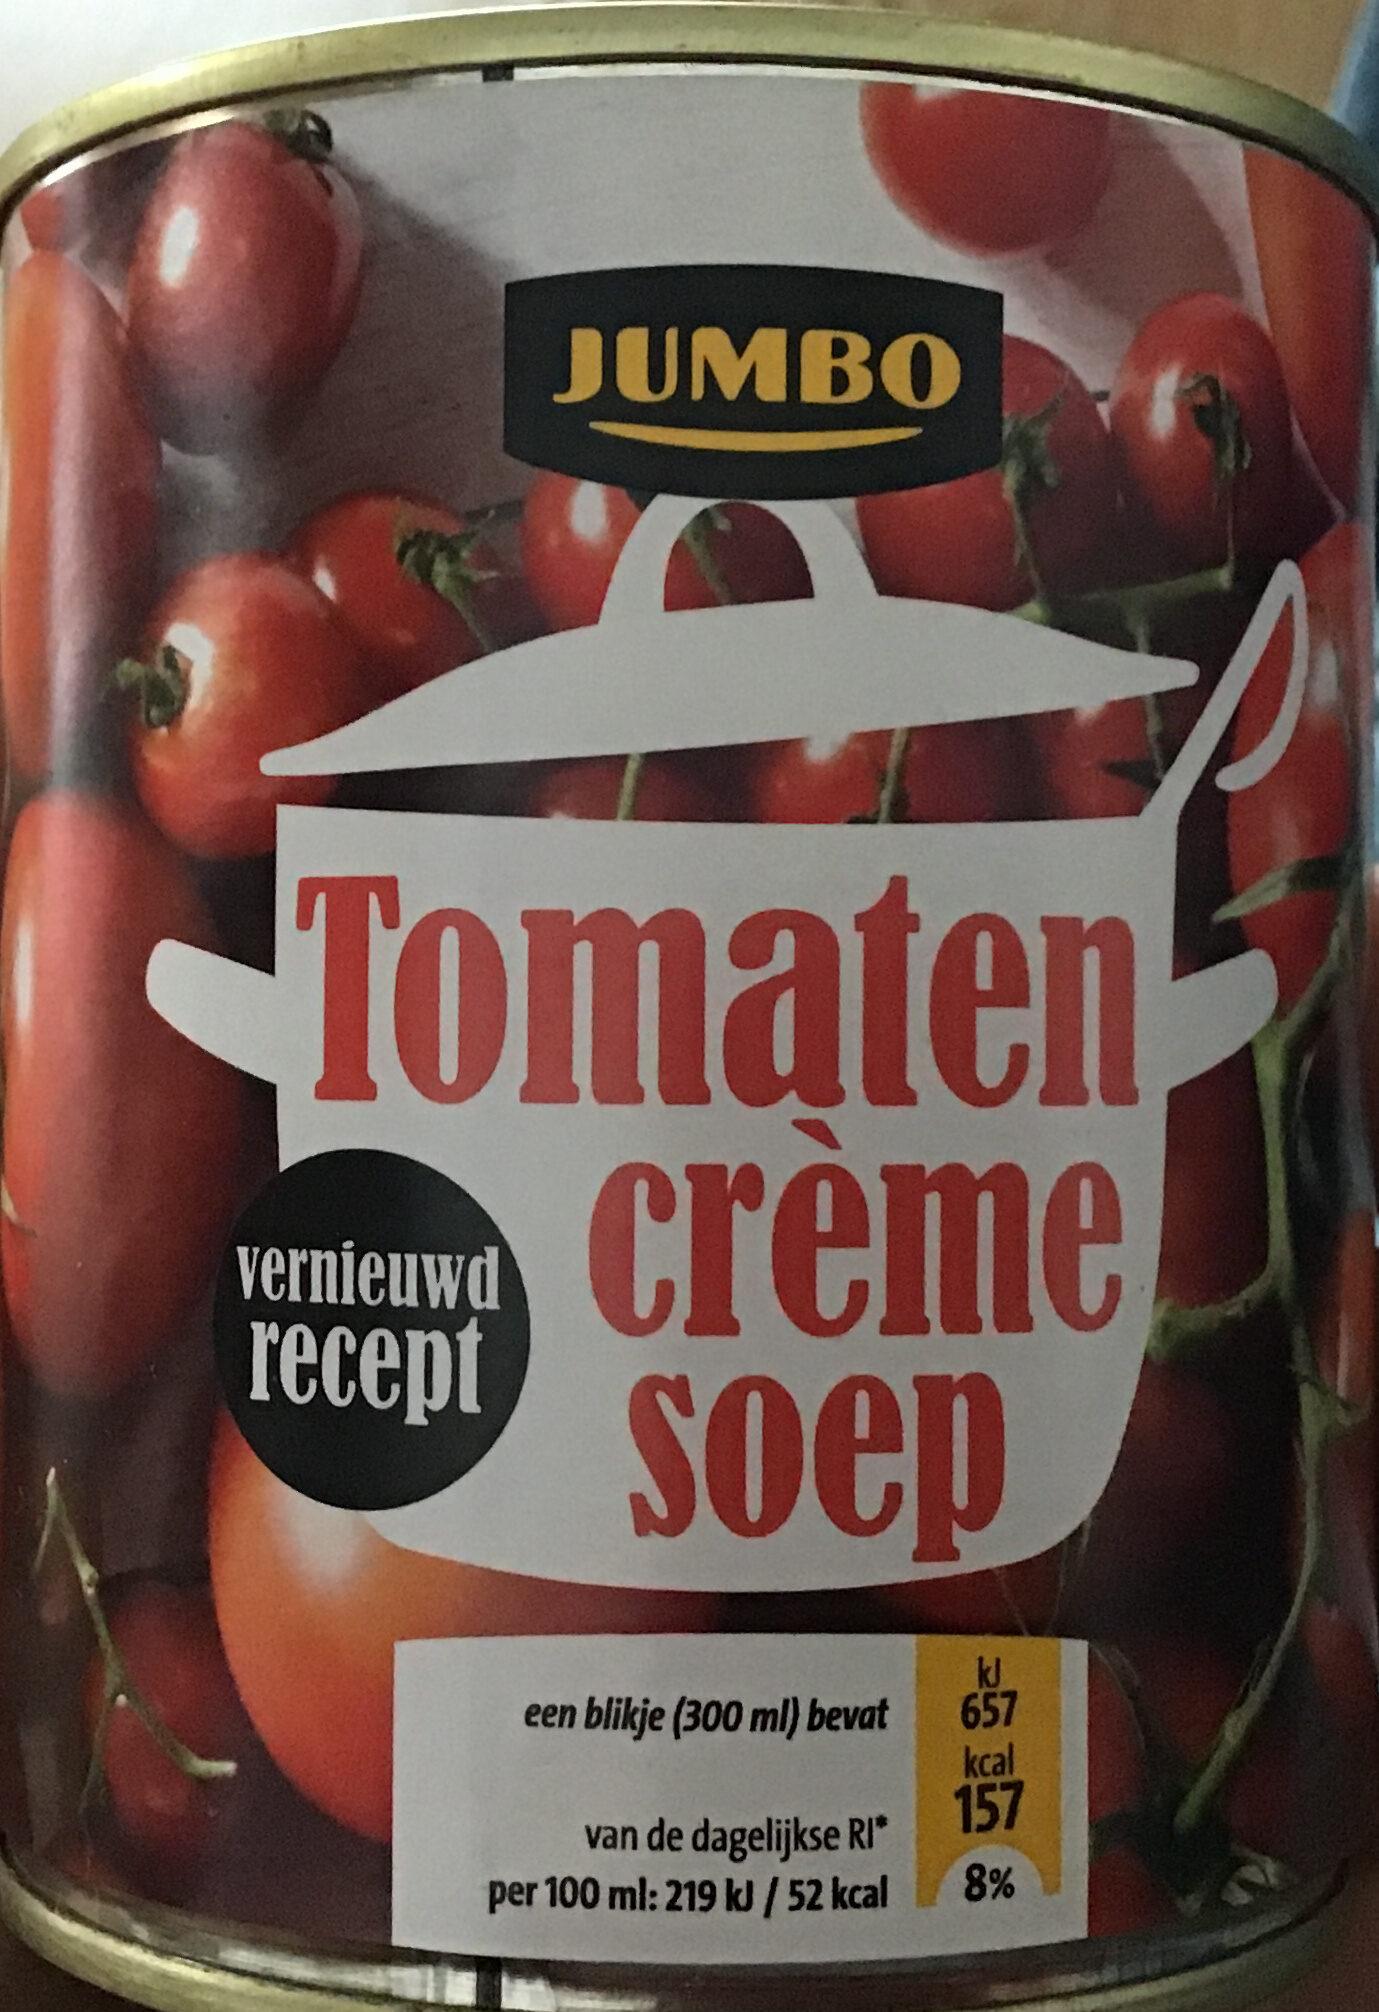 Tomaten crèmesoep - Product - nl